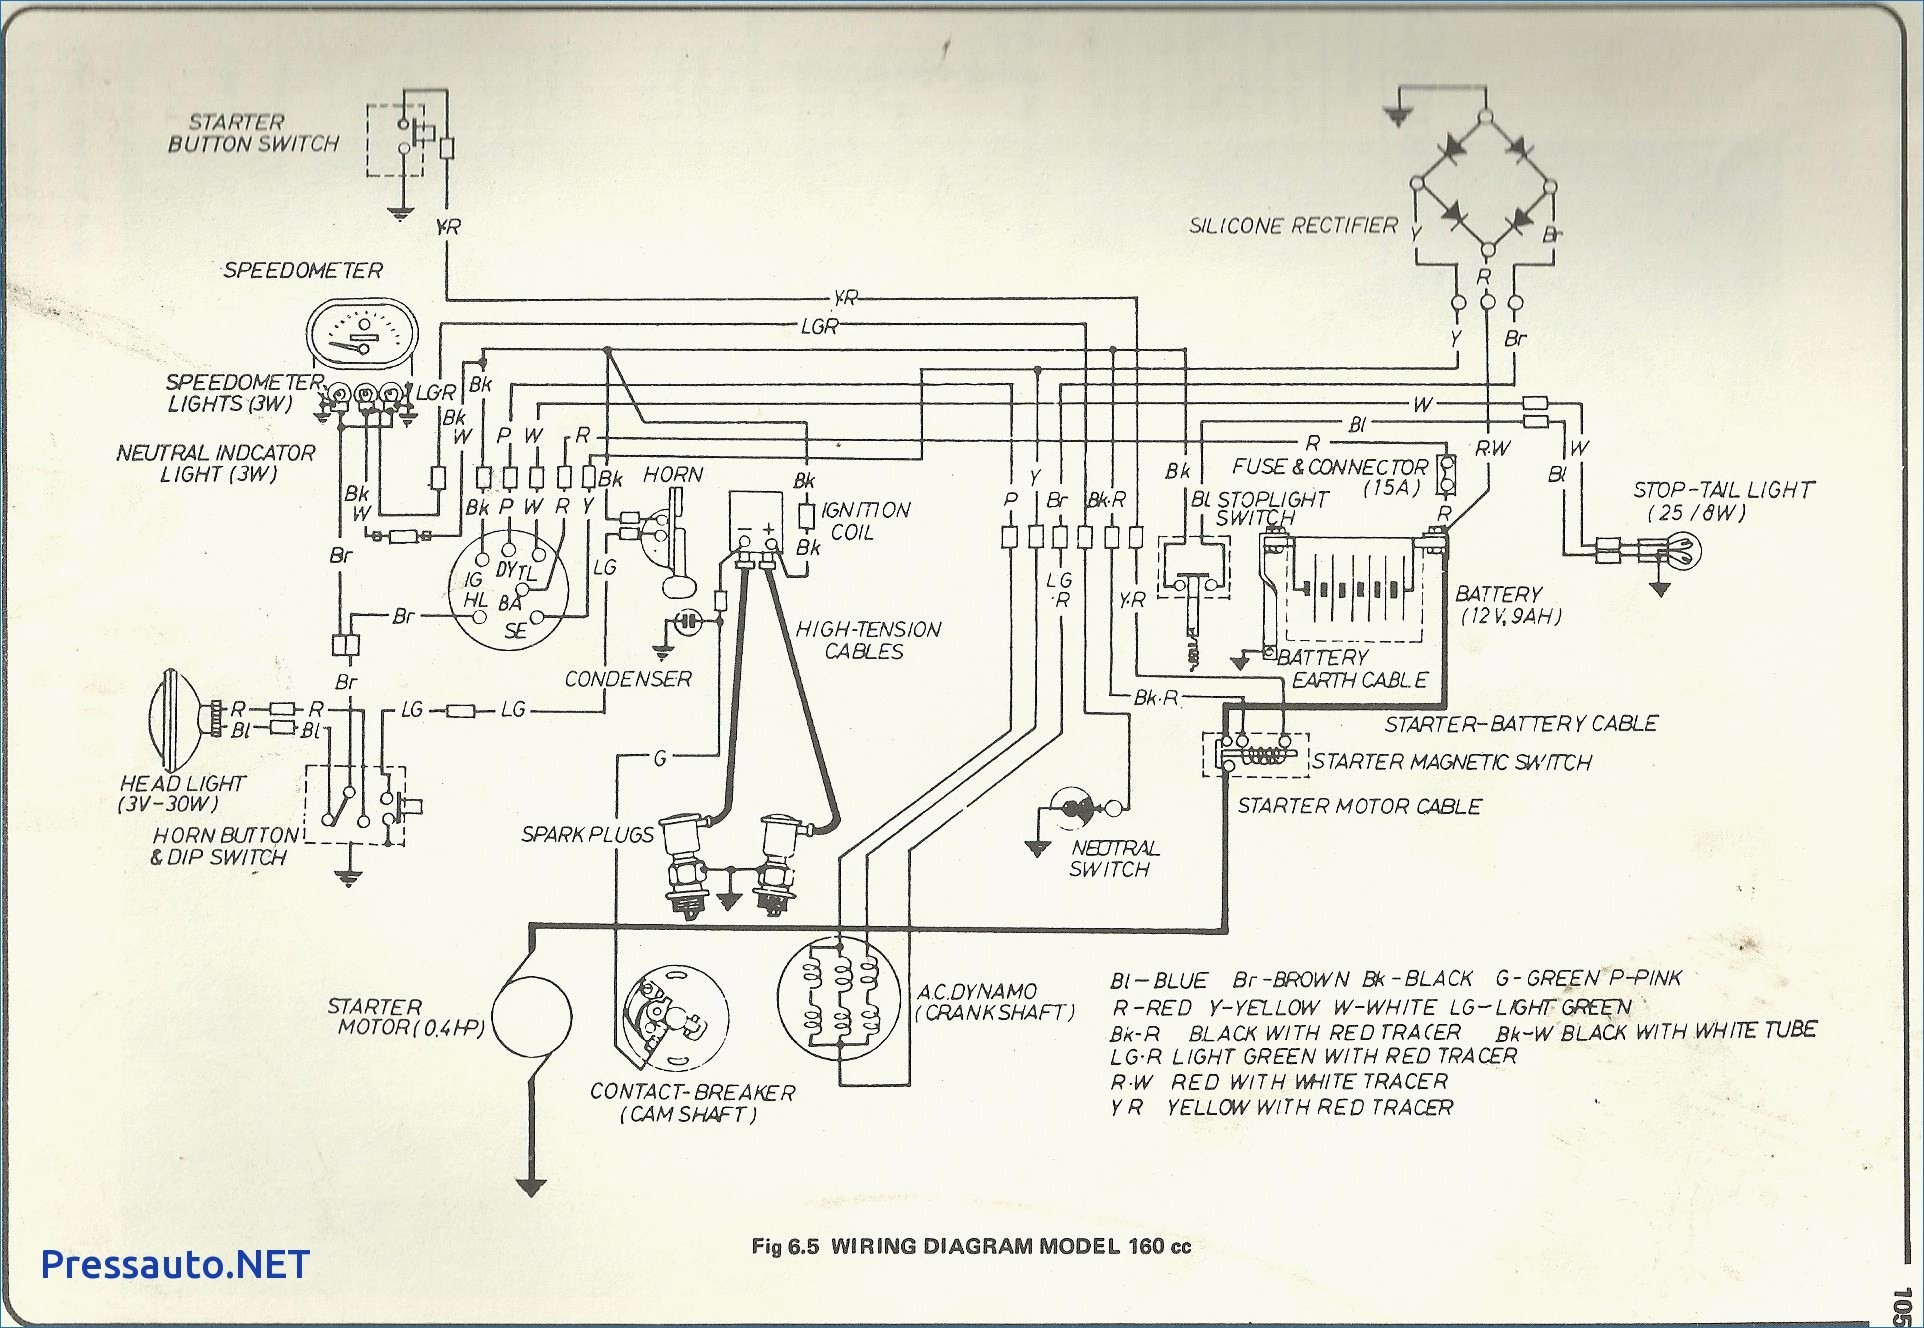 understanding hvac wiring diagrams 4way dlx fujitsu mini split heat pump diagram free